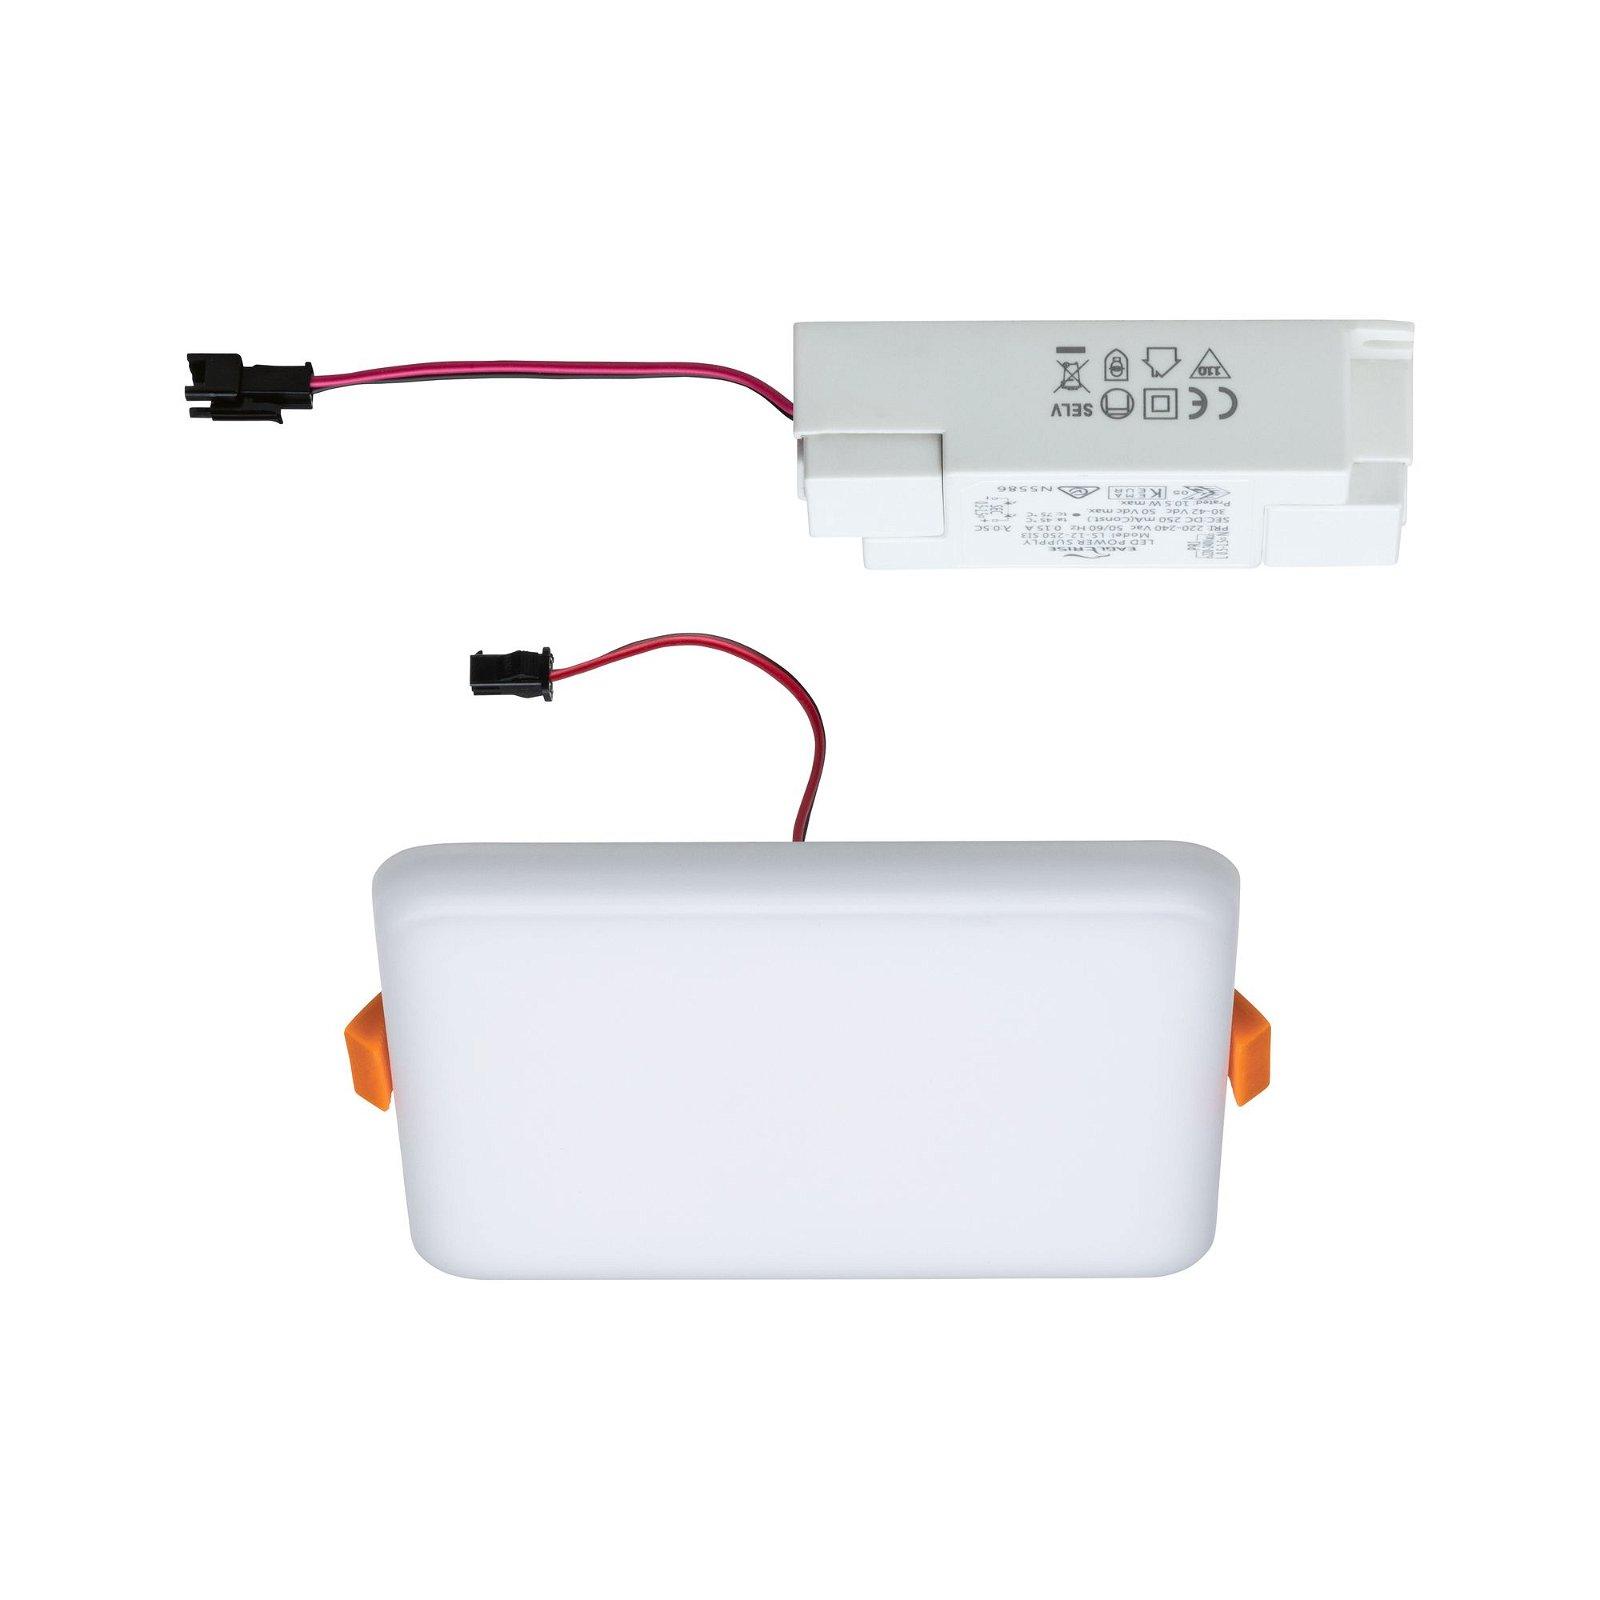 VariFit LED Einbaupanel Veluna IP44 IP44 eckig 125x125mm 3000K Satin